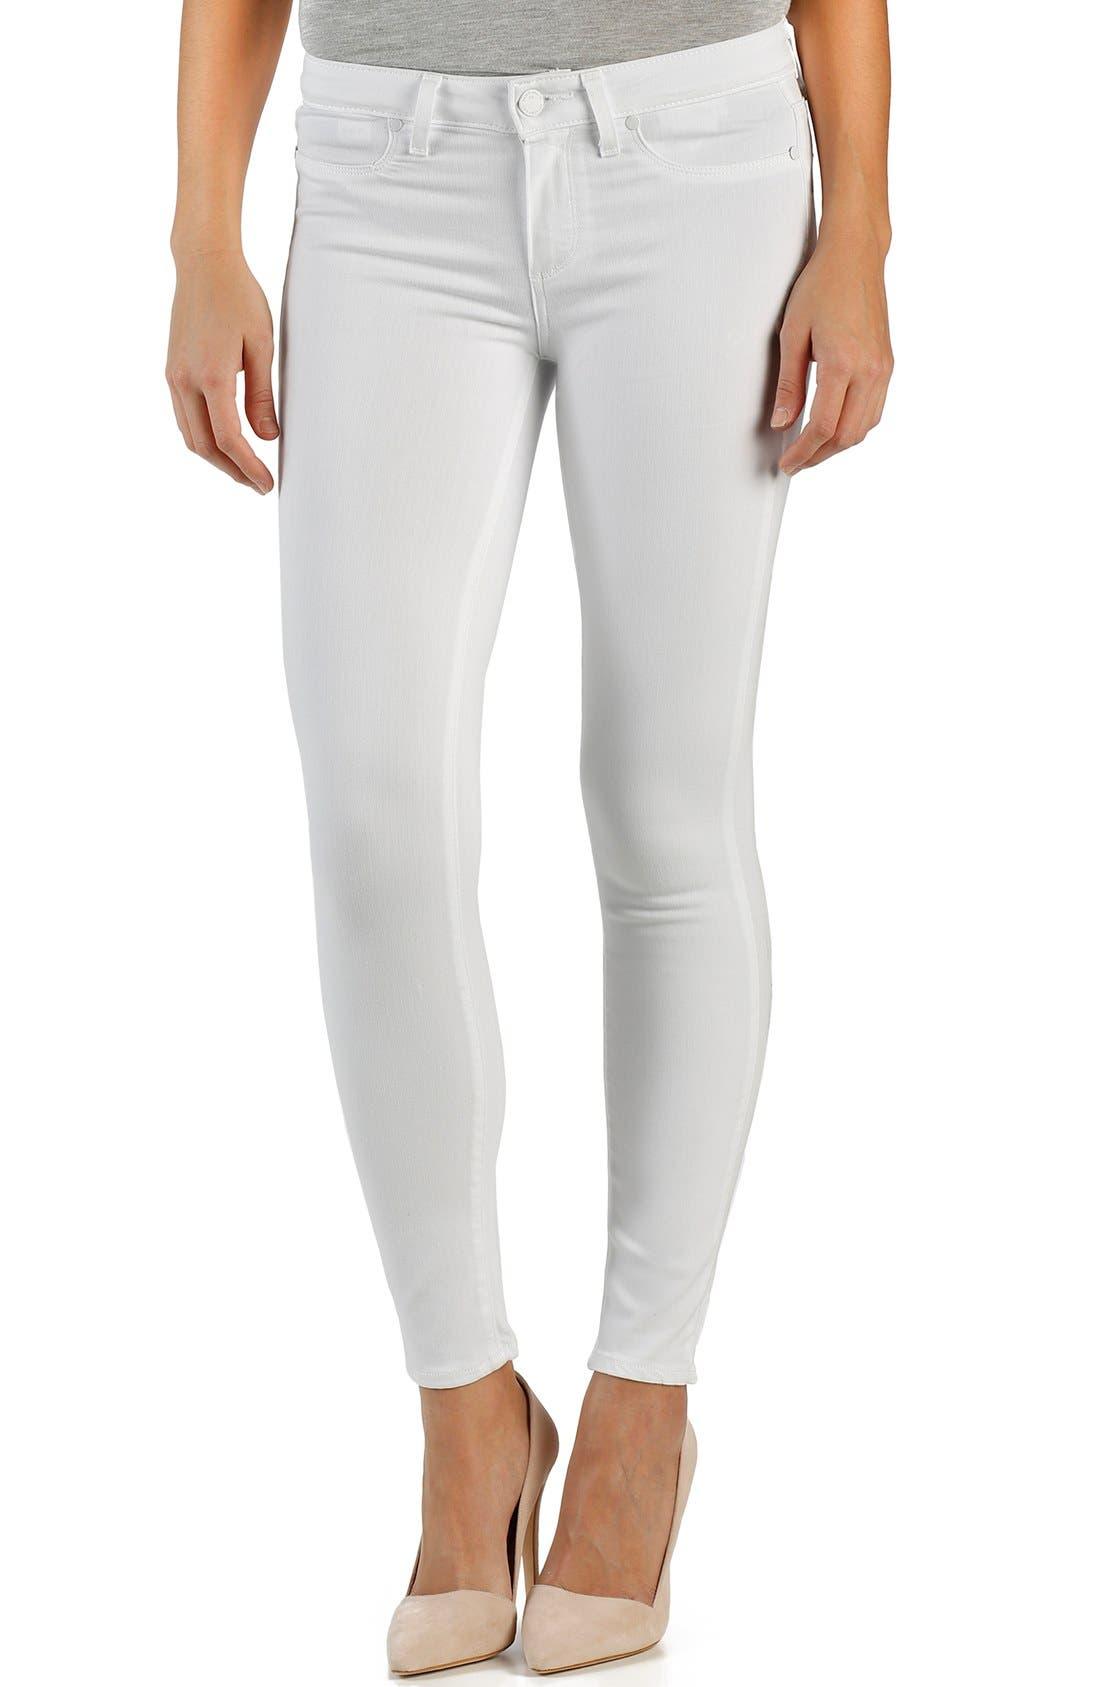 Main Image - Paige Denim 'Transcend - Verdugo' Ankle Skinny Jeans (White Mist)